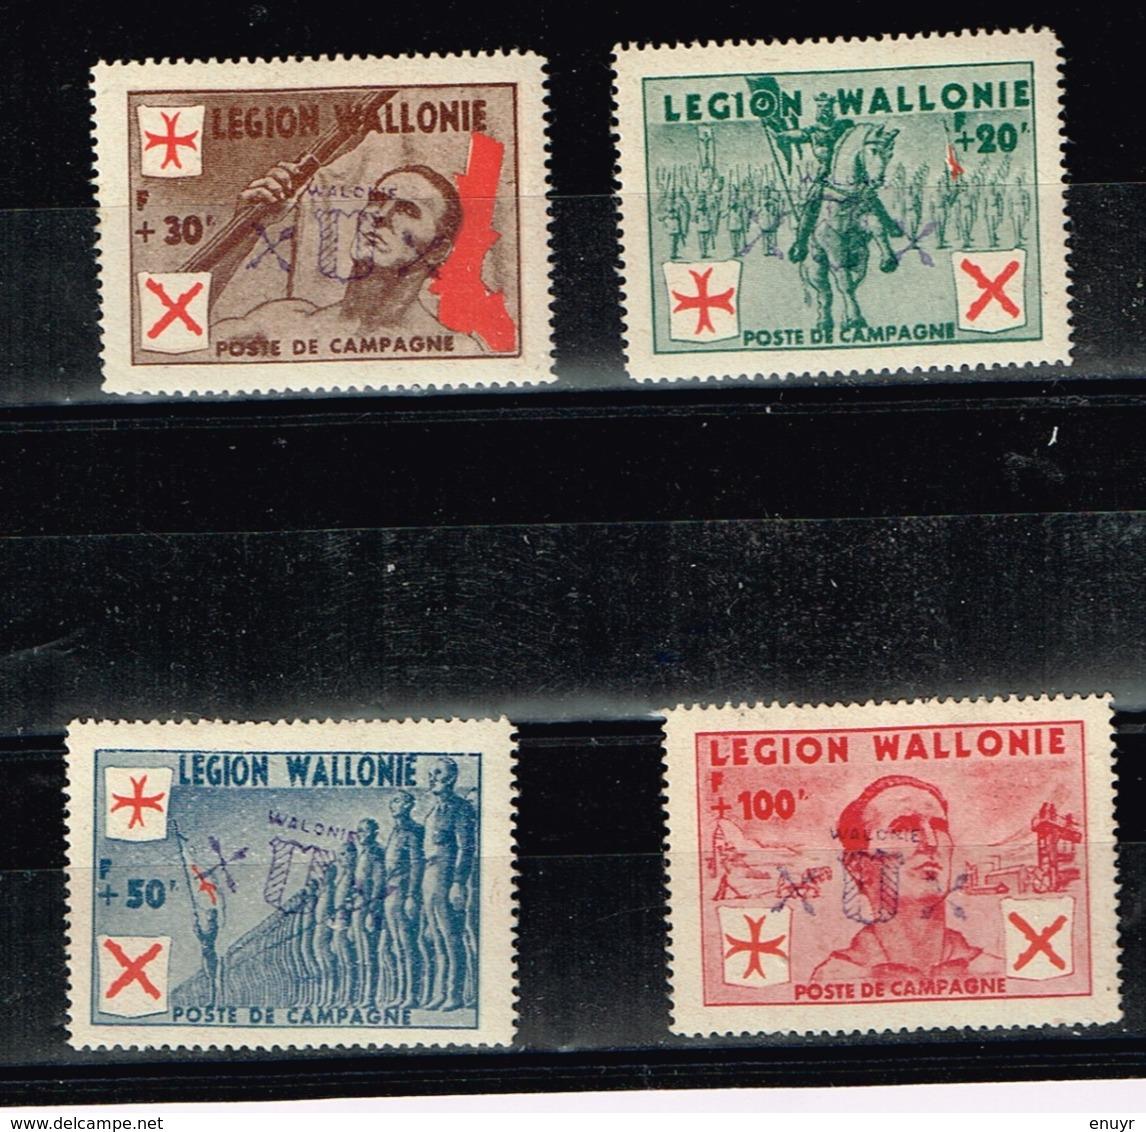 Légion Wallonie Feldpost - Stamps